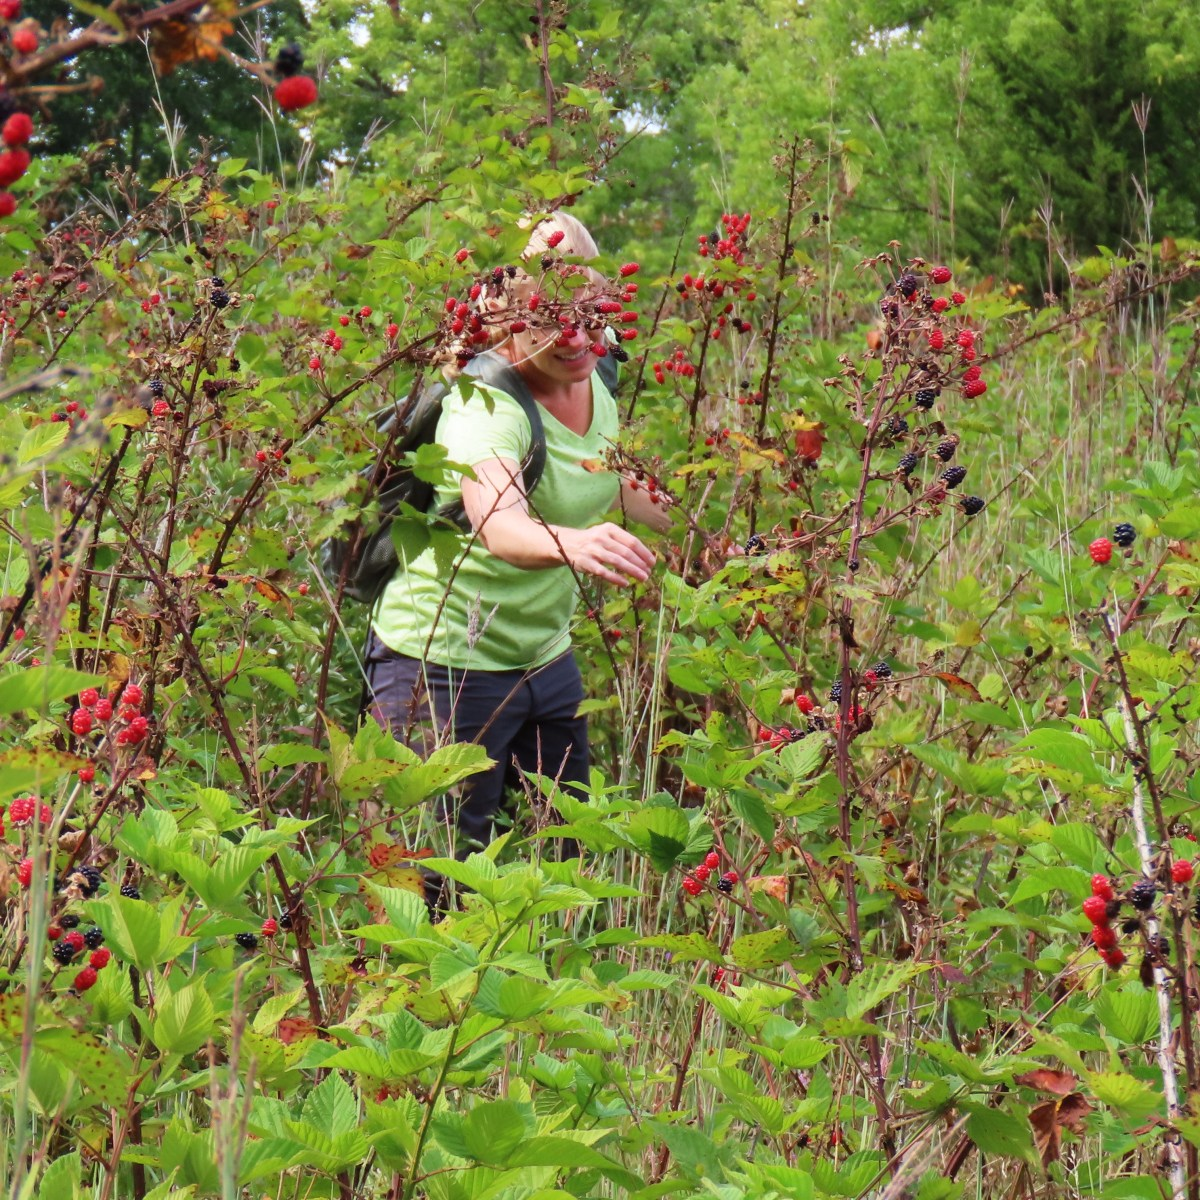 A woman picking blackberries